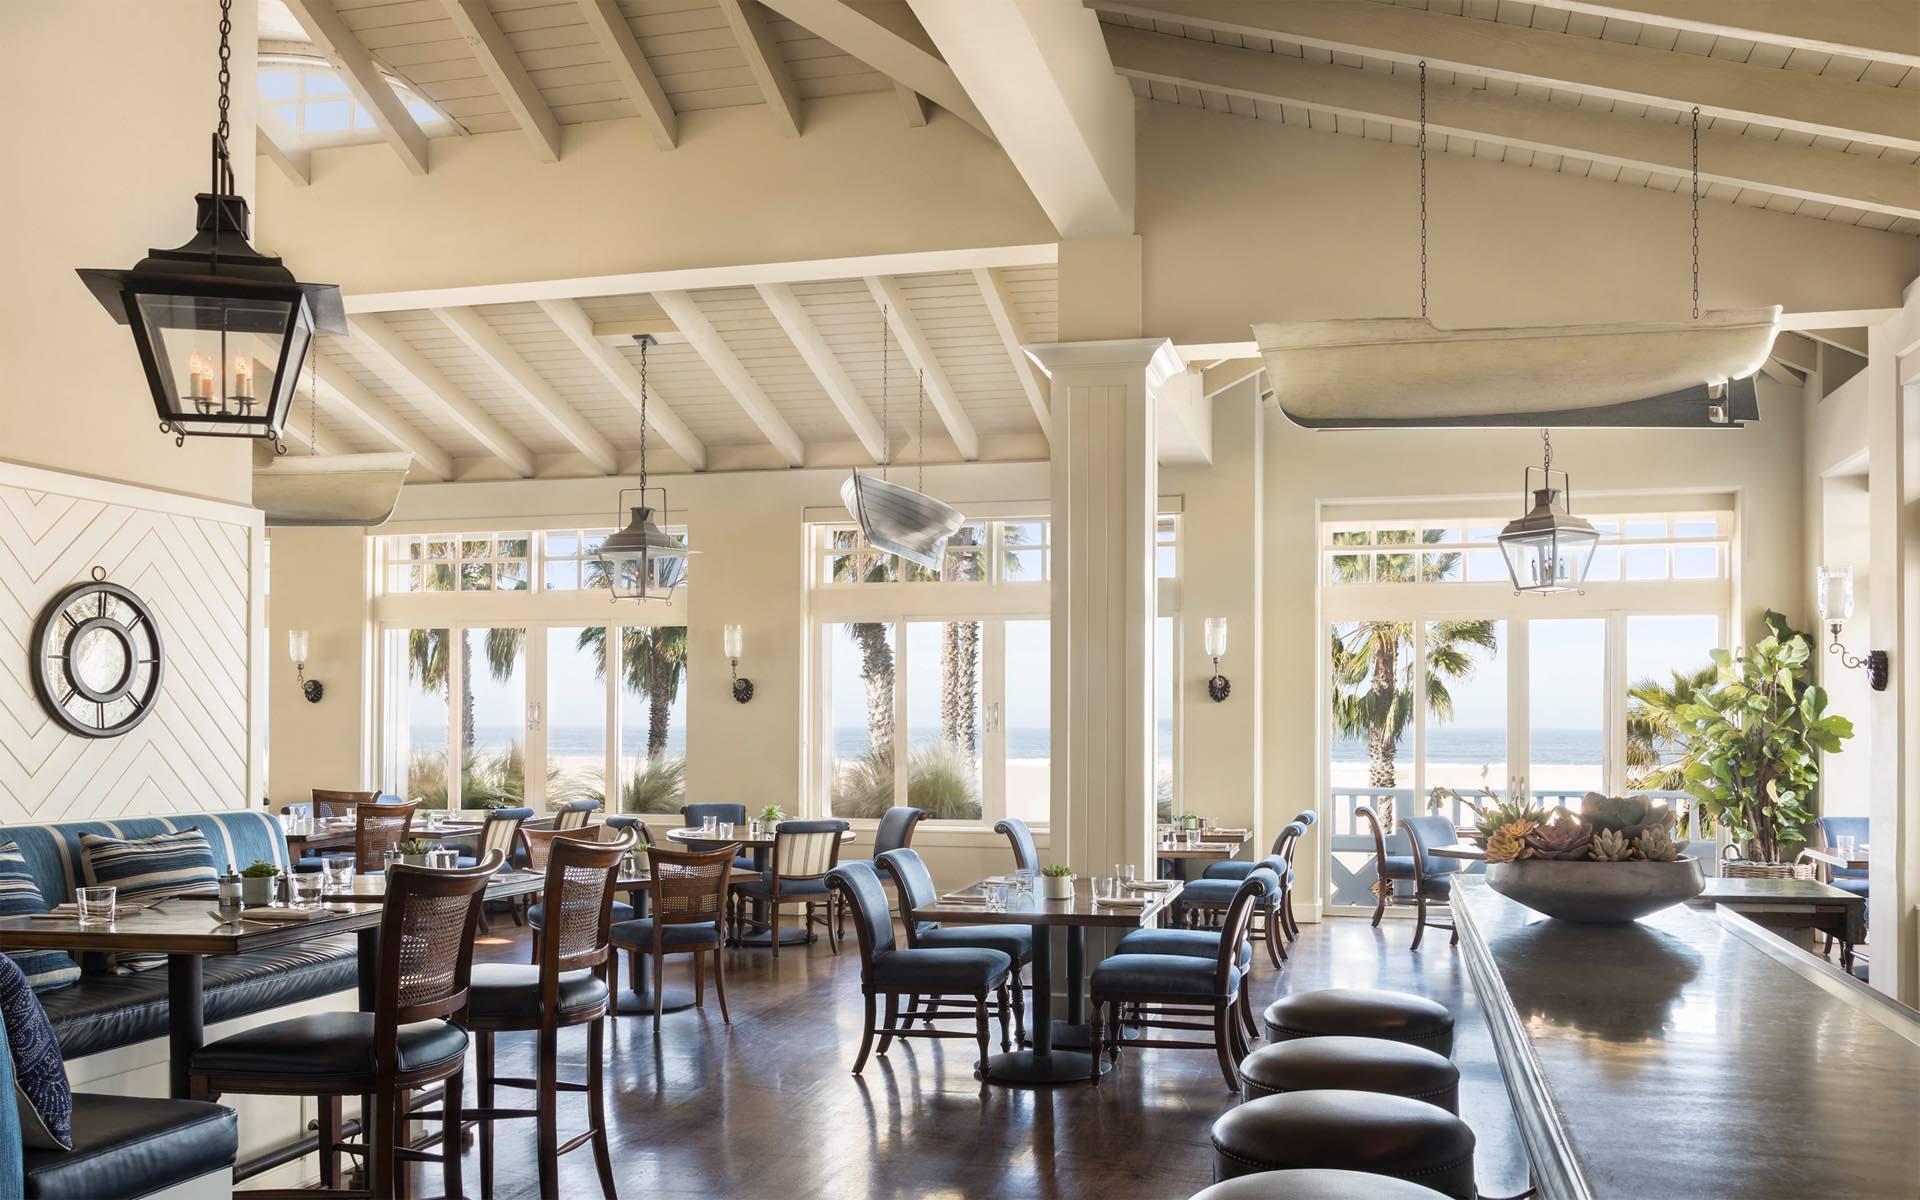 Living Room - Luxury Hotel Lounge in Santa Monica | Shutters on ...